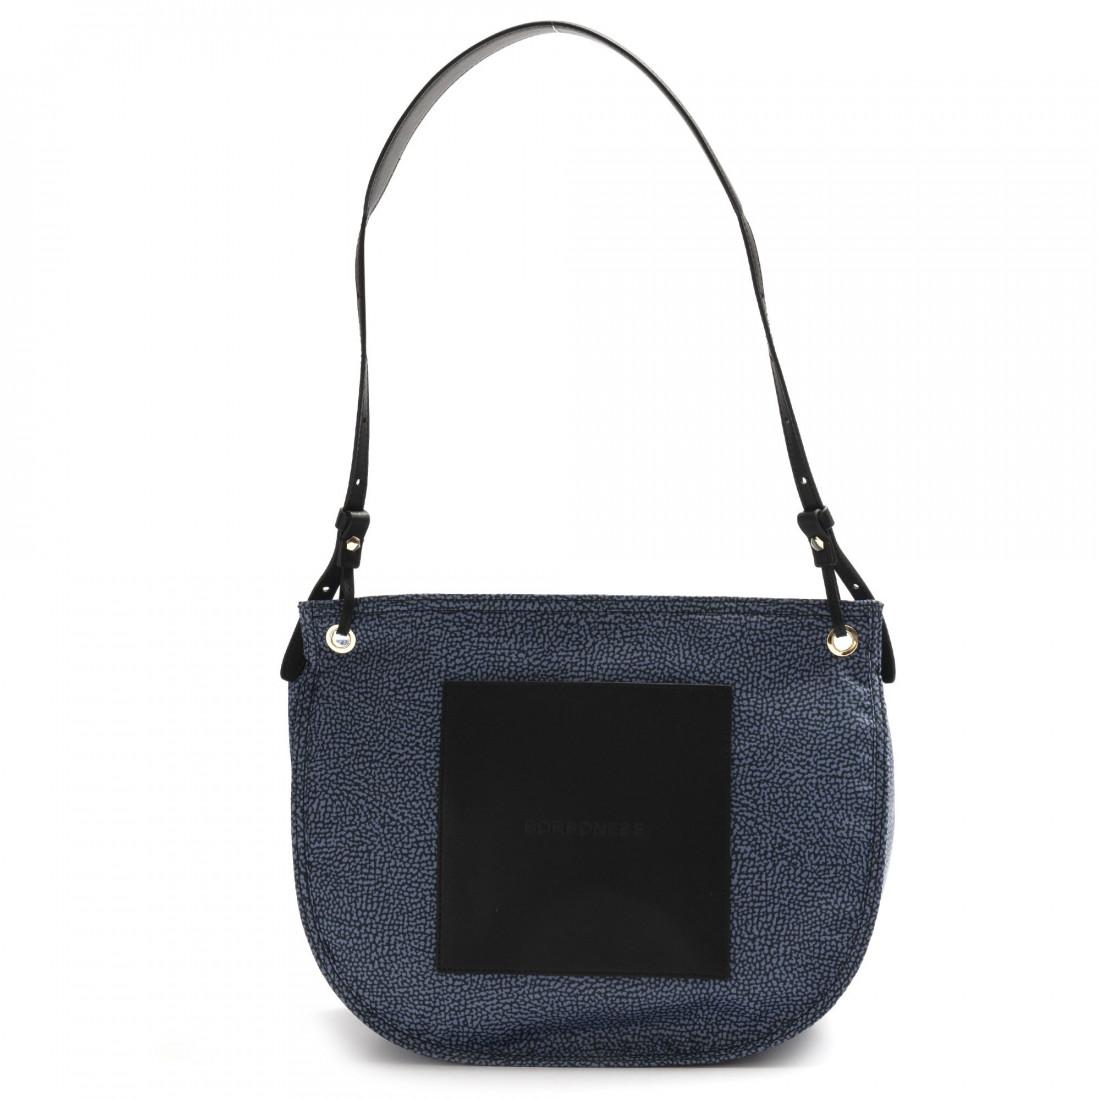 handbags woman borbonese 933369i15880 8442